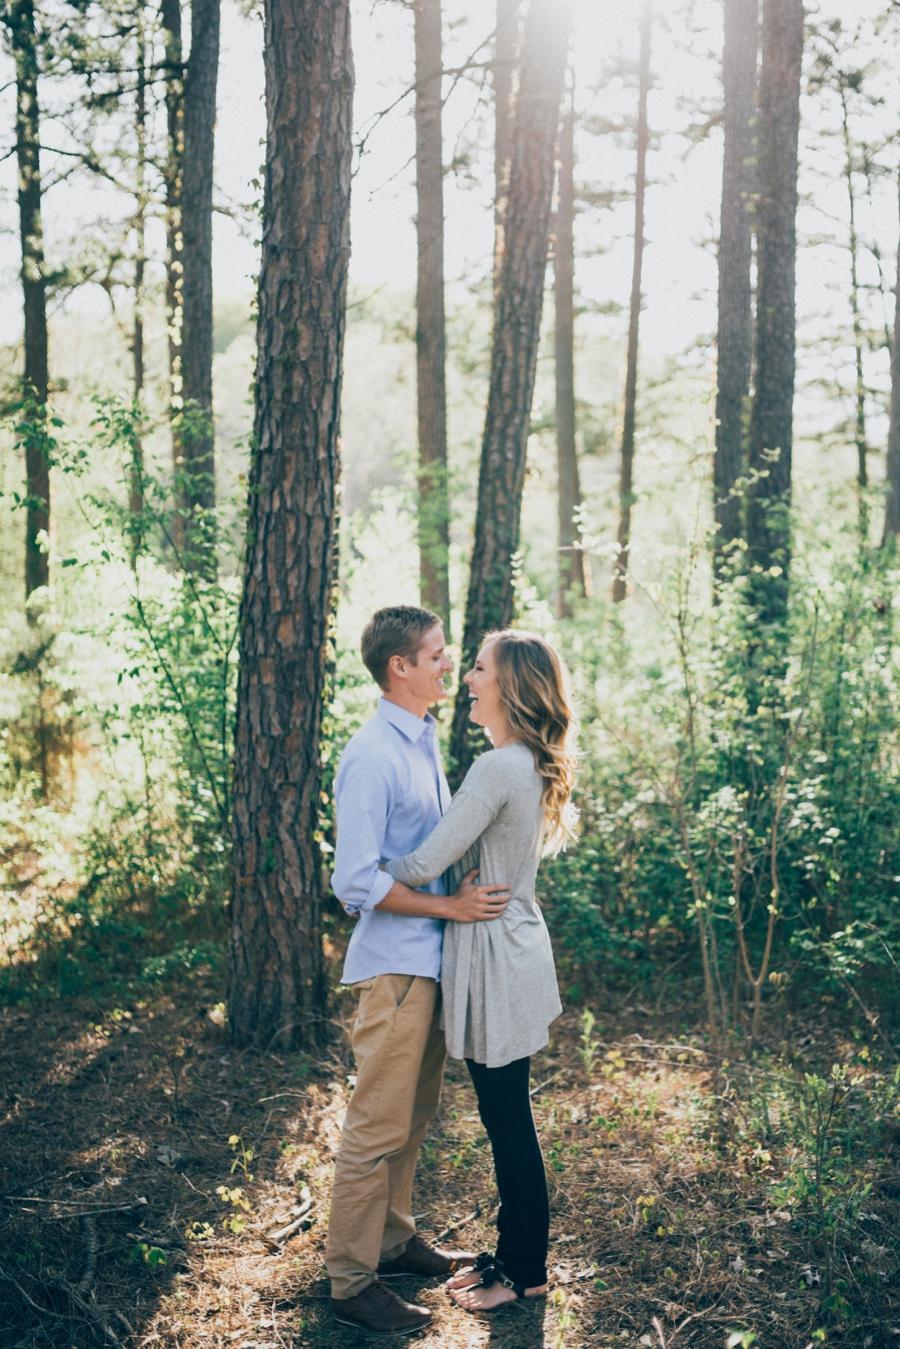 Rockwoods Reservation | Engagement Photography